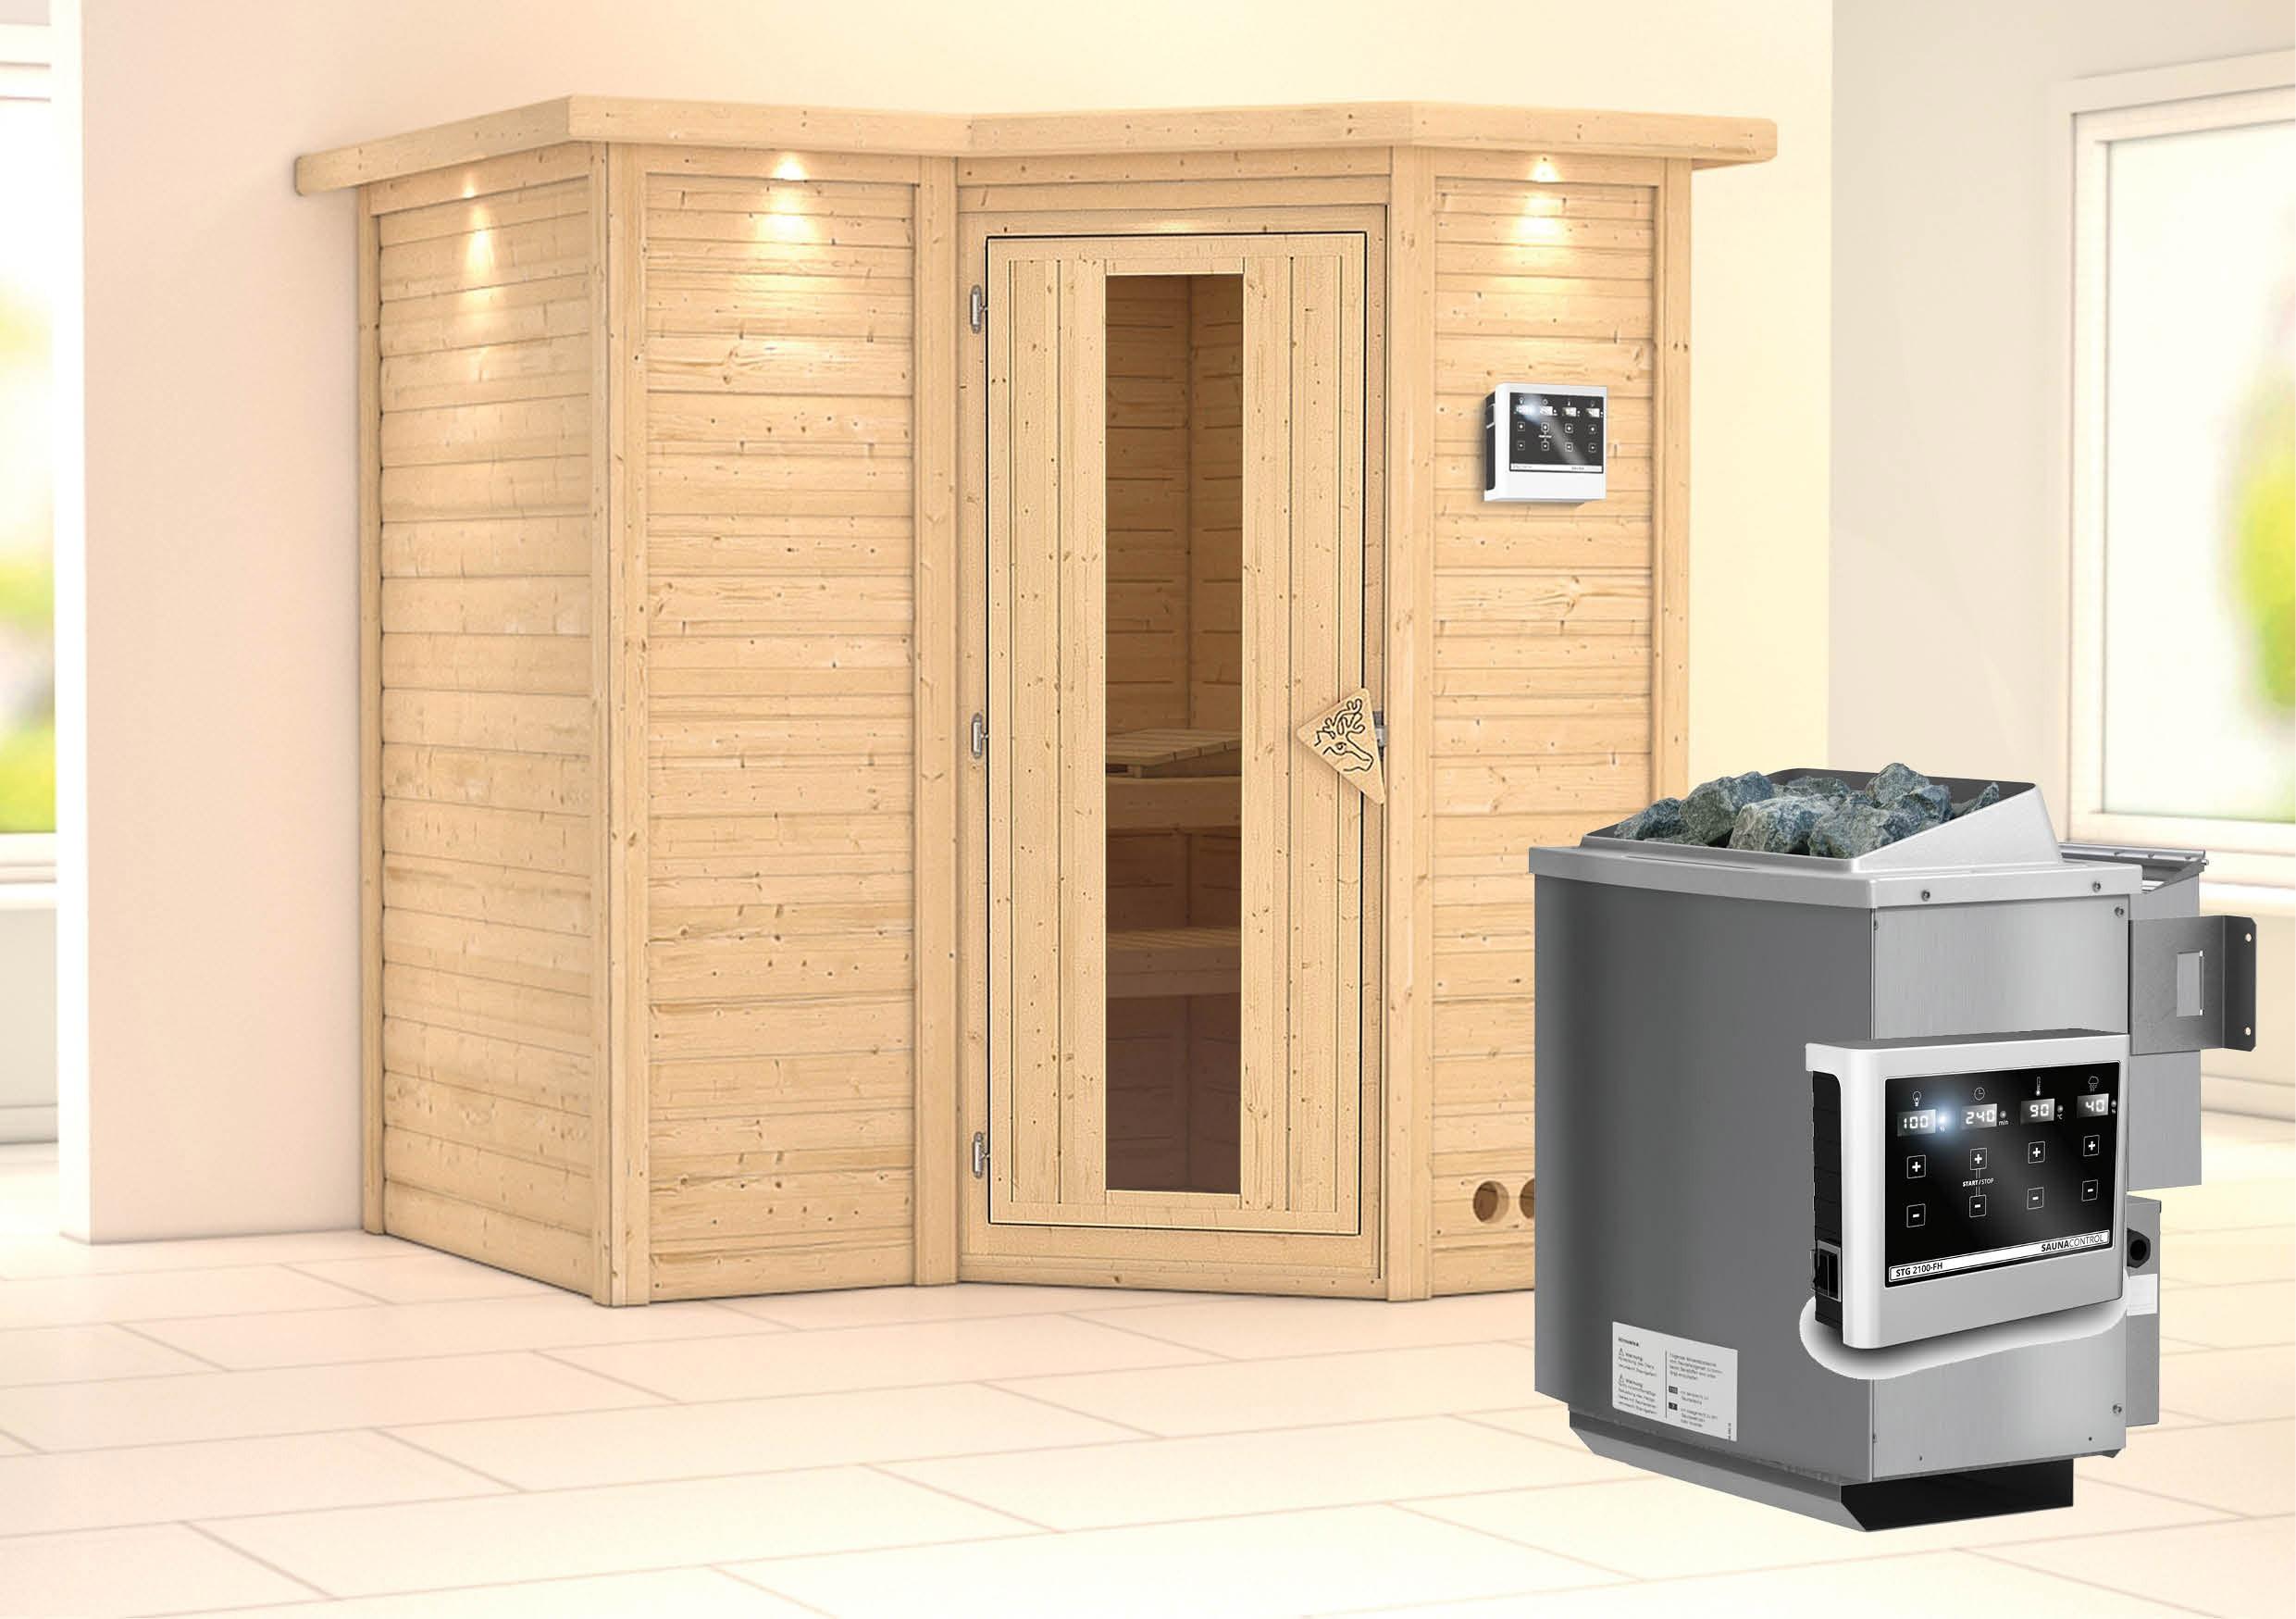 Karibu Sauna Sahib 1 40mm Dachkranz + Bio Ofen 9kW extern Holztür Bild 1